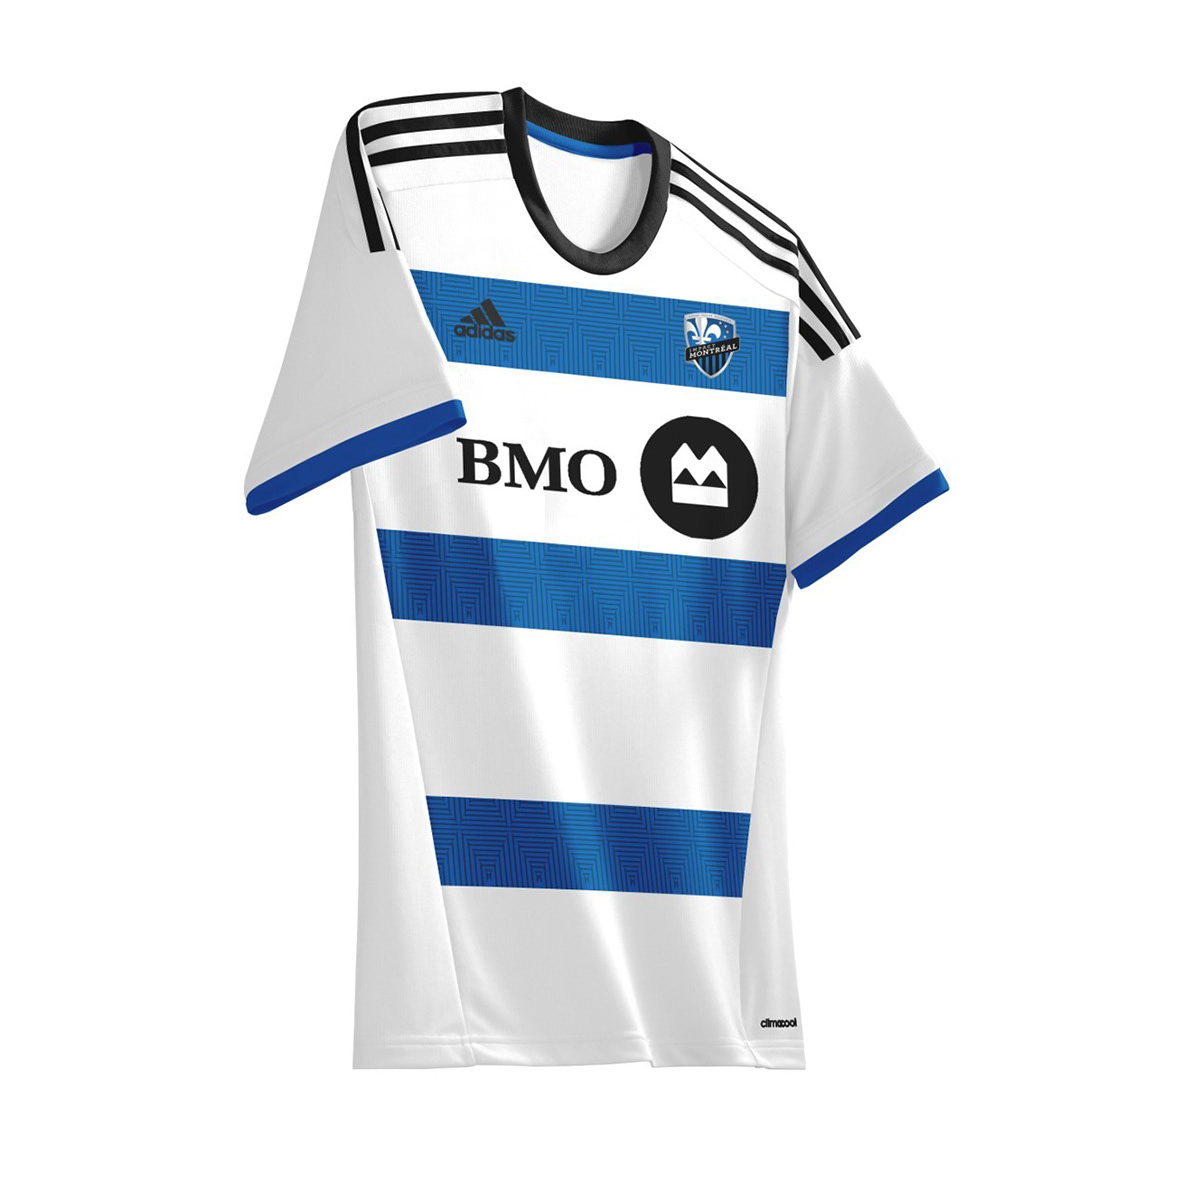 484bea04ebac5 Adidas MLS Concept Kits 2018 19. Michael McGillycuddy •. Follow Following  Unfollow. Save to Collection